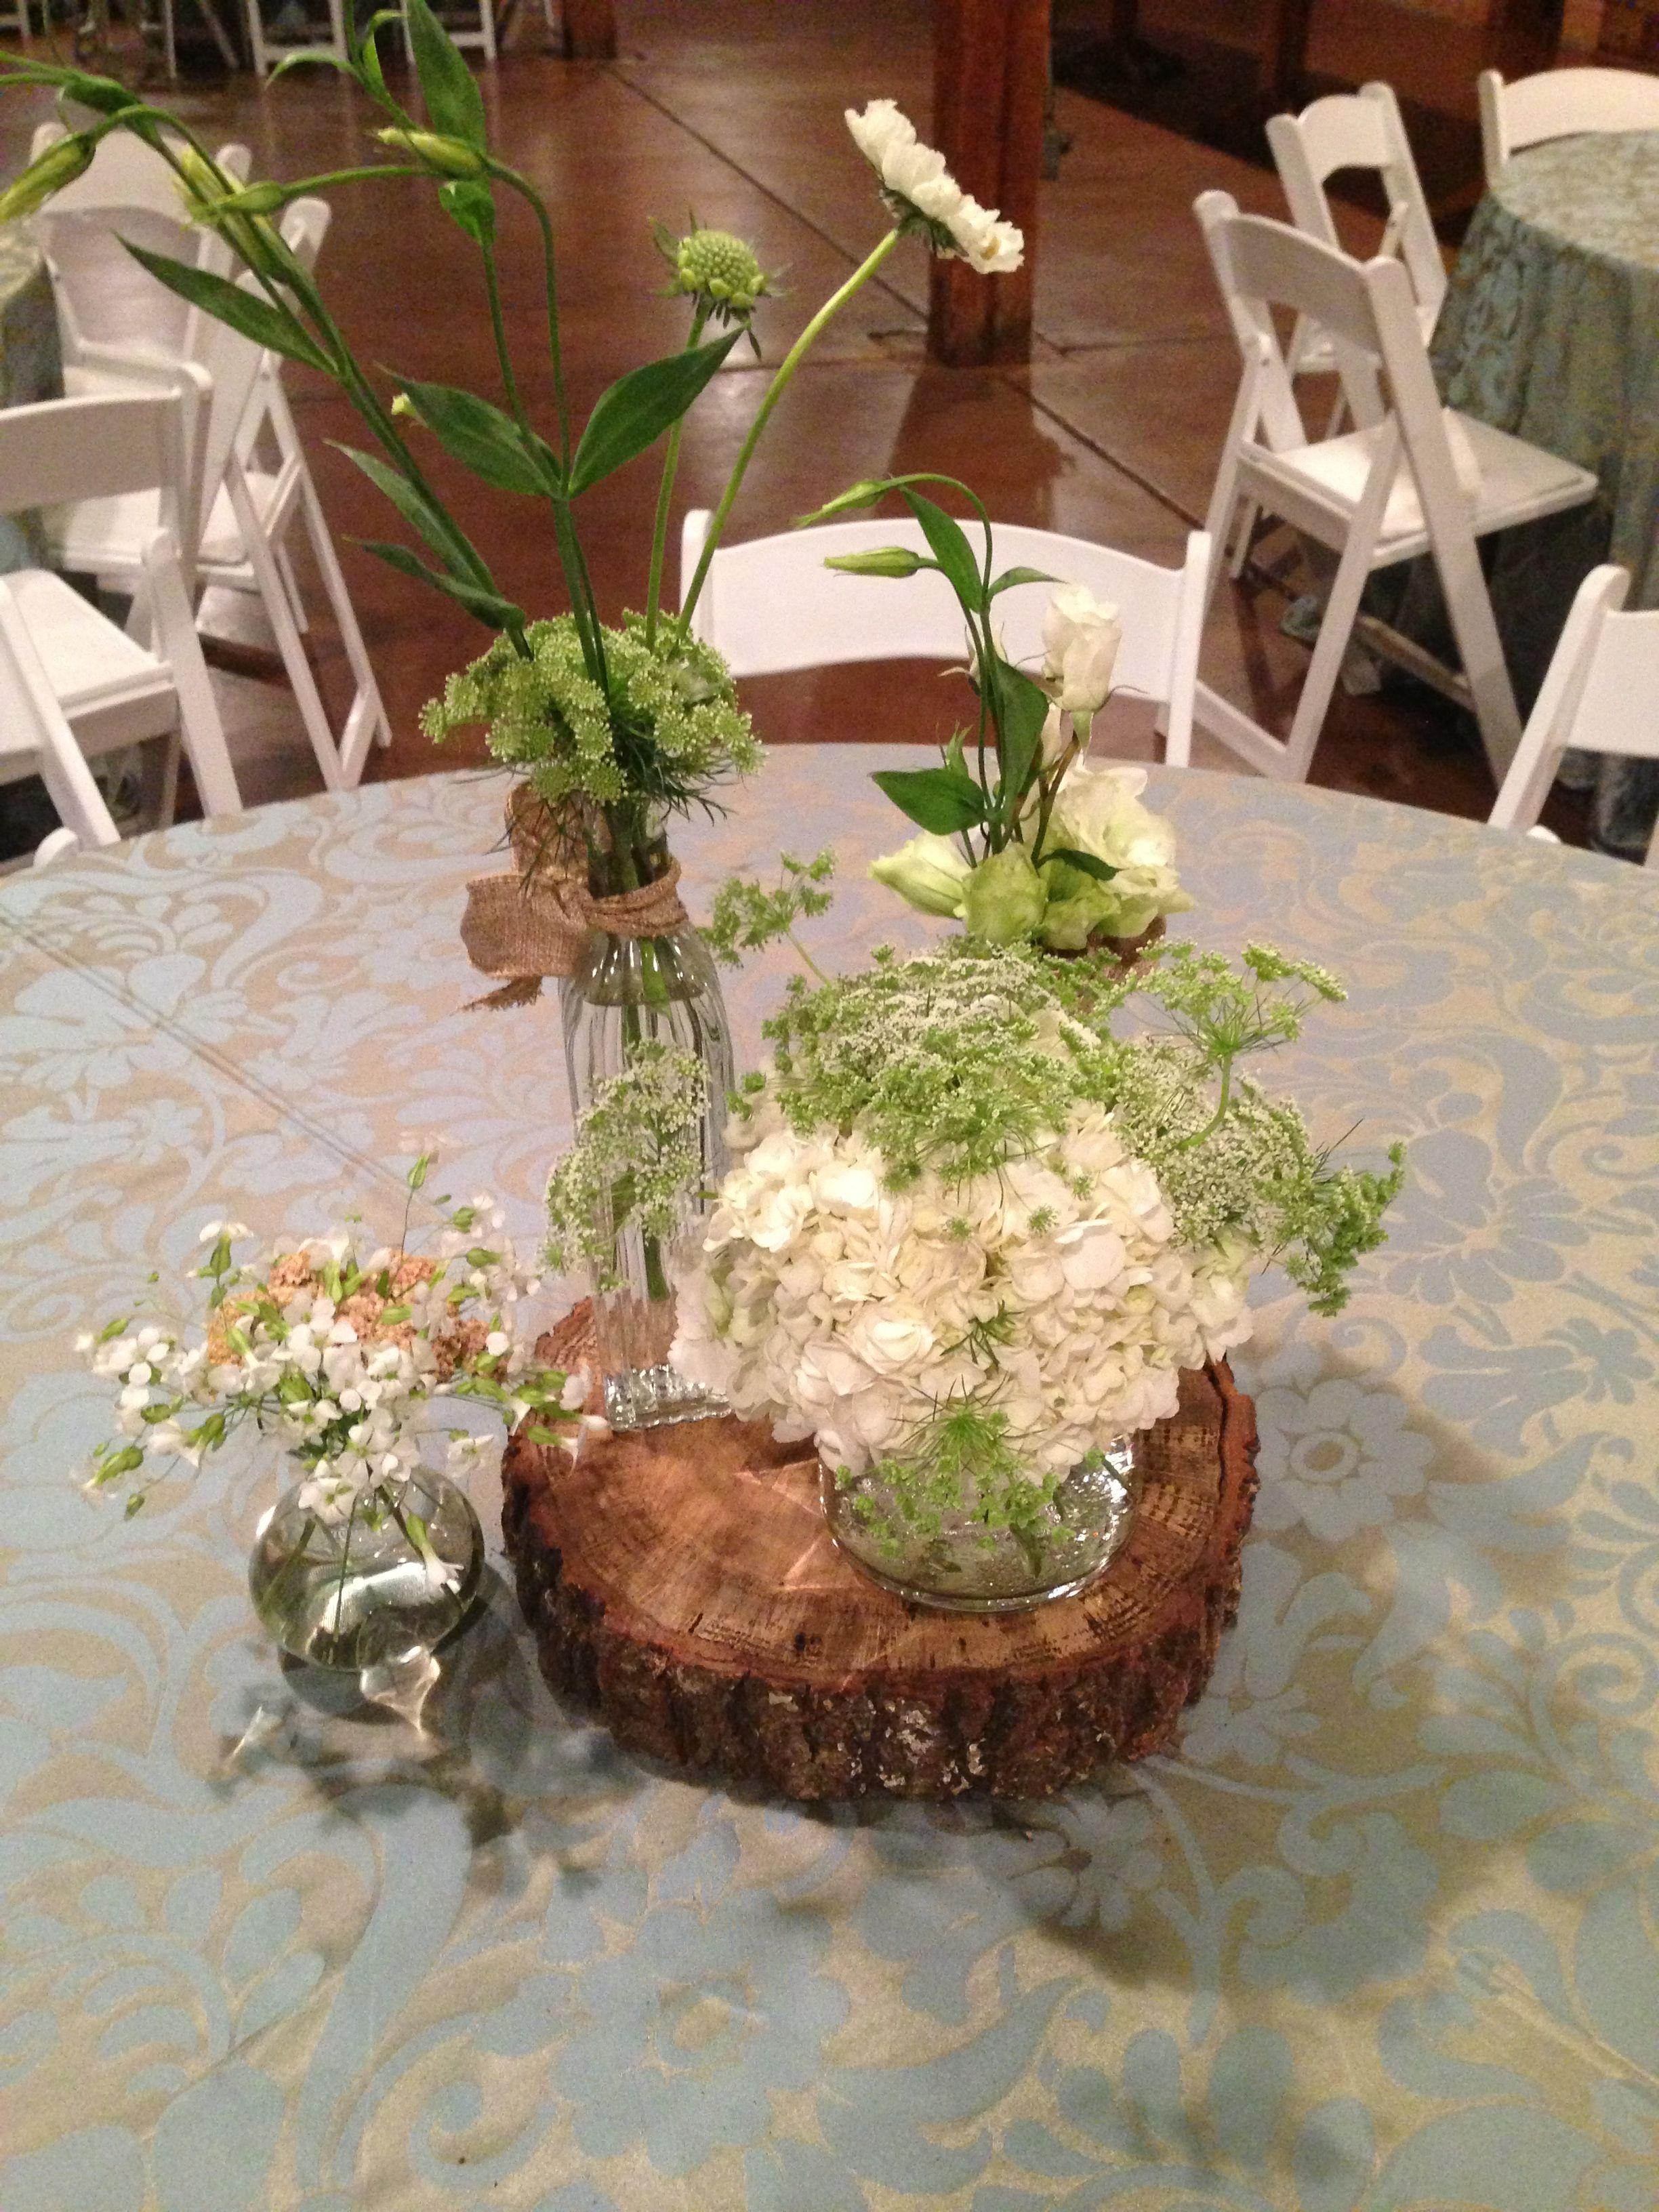 Over the top wedding decorations  Rustic wedding table center piece  Ideas  Pinterest  Wedding